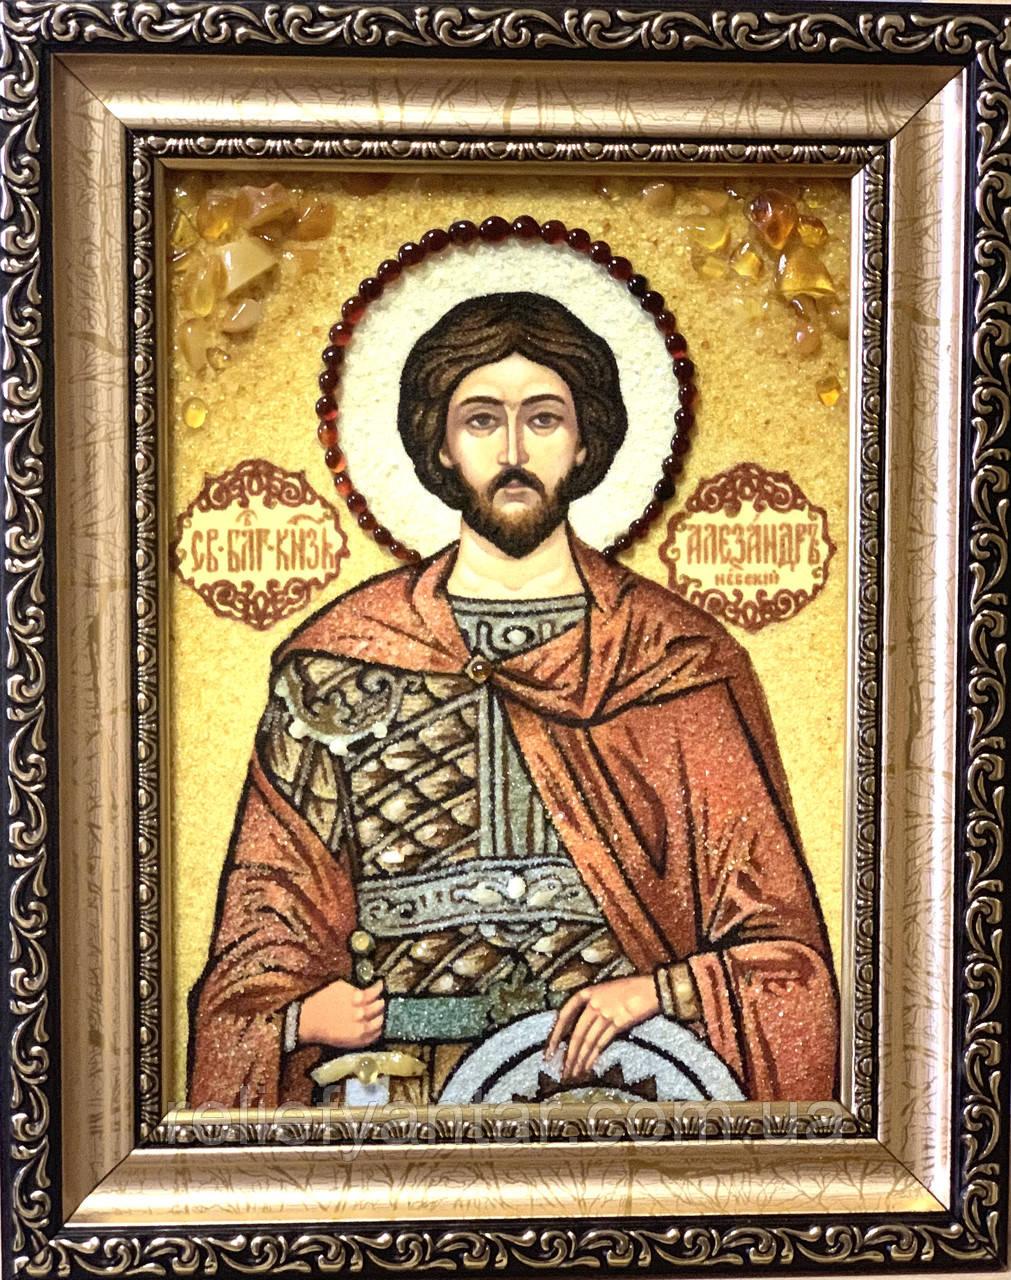 Икона именная Александр  Невский из янтаря , Ікона іменна Олександр Невський  30x40 см